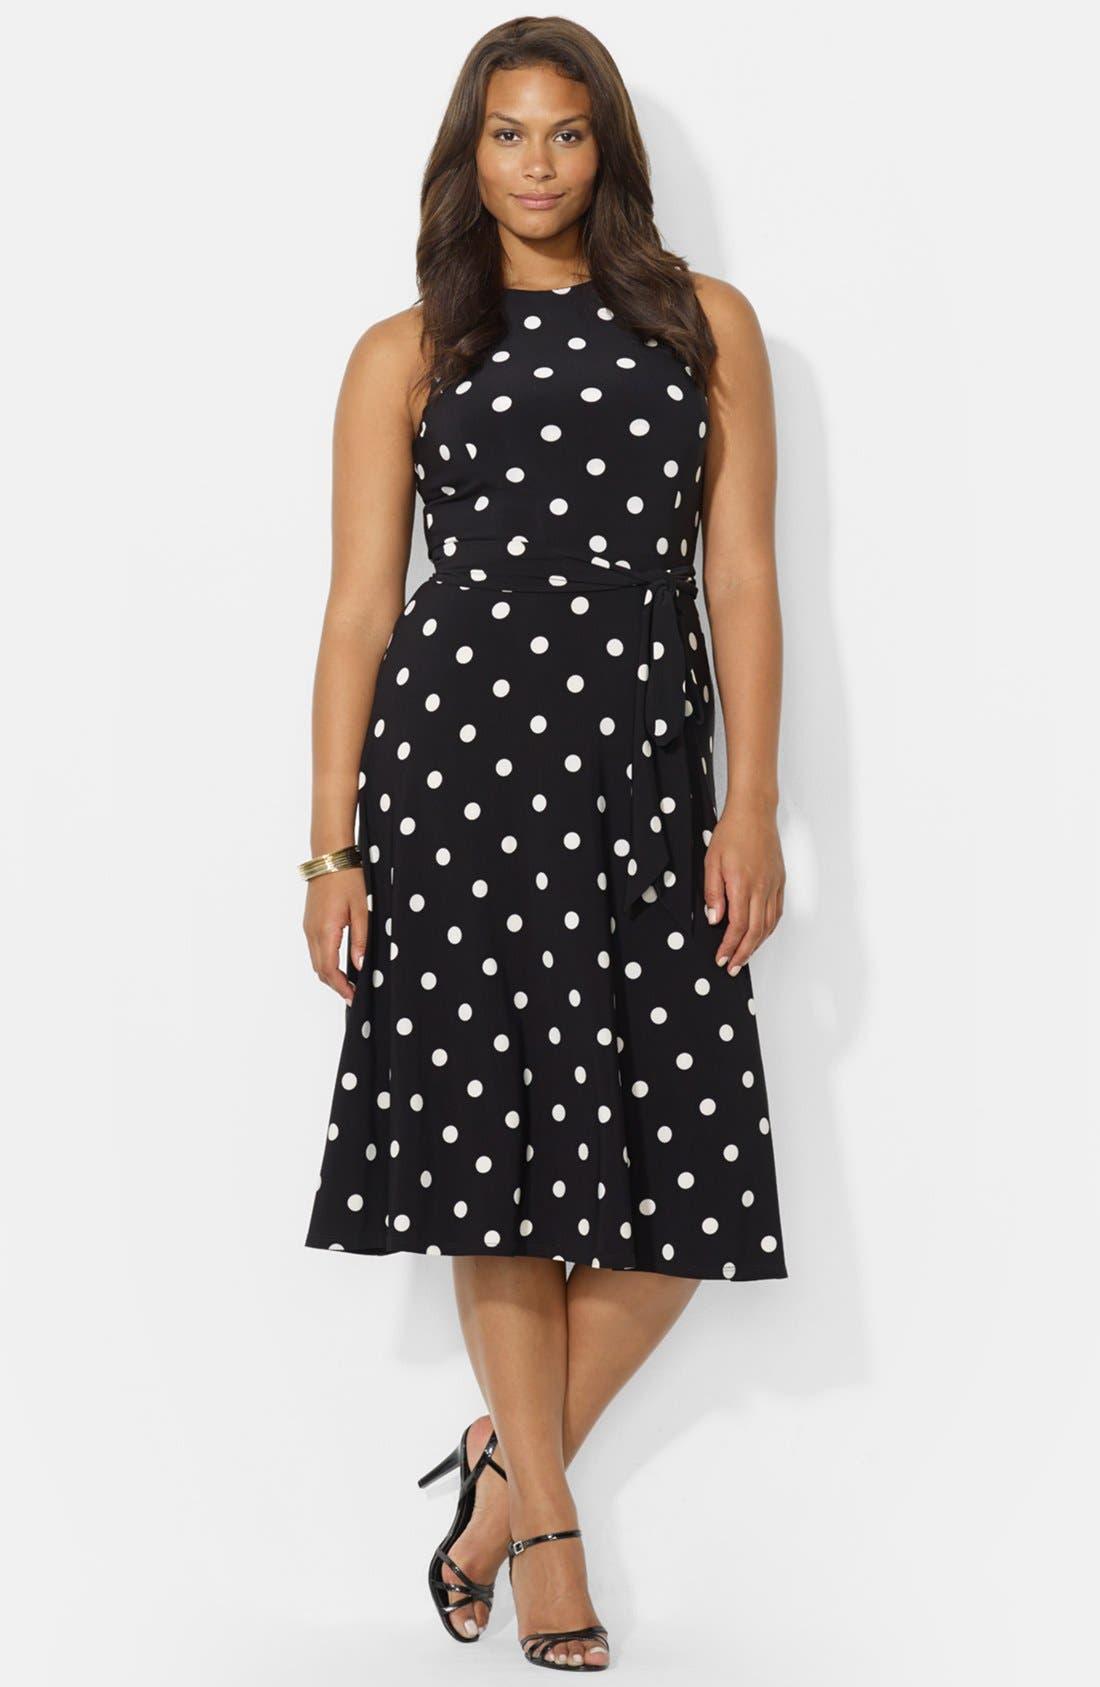 Alternate Image 1 Selected - Lauren Ralph Lauren Polka Dot Jersey Fit & Flare Dress (Plus Size)